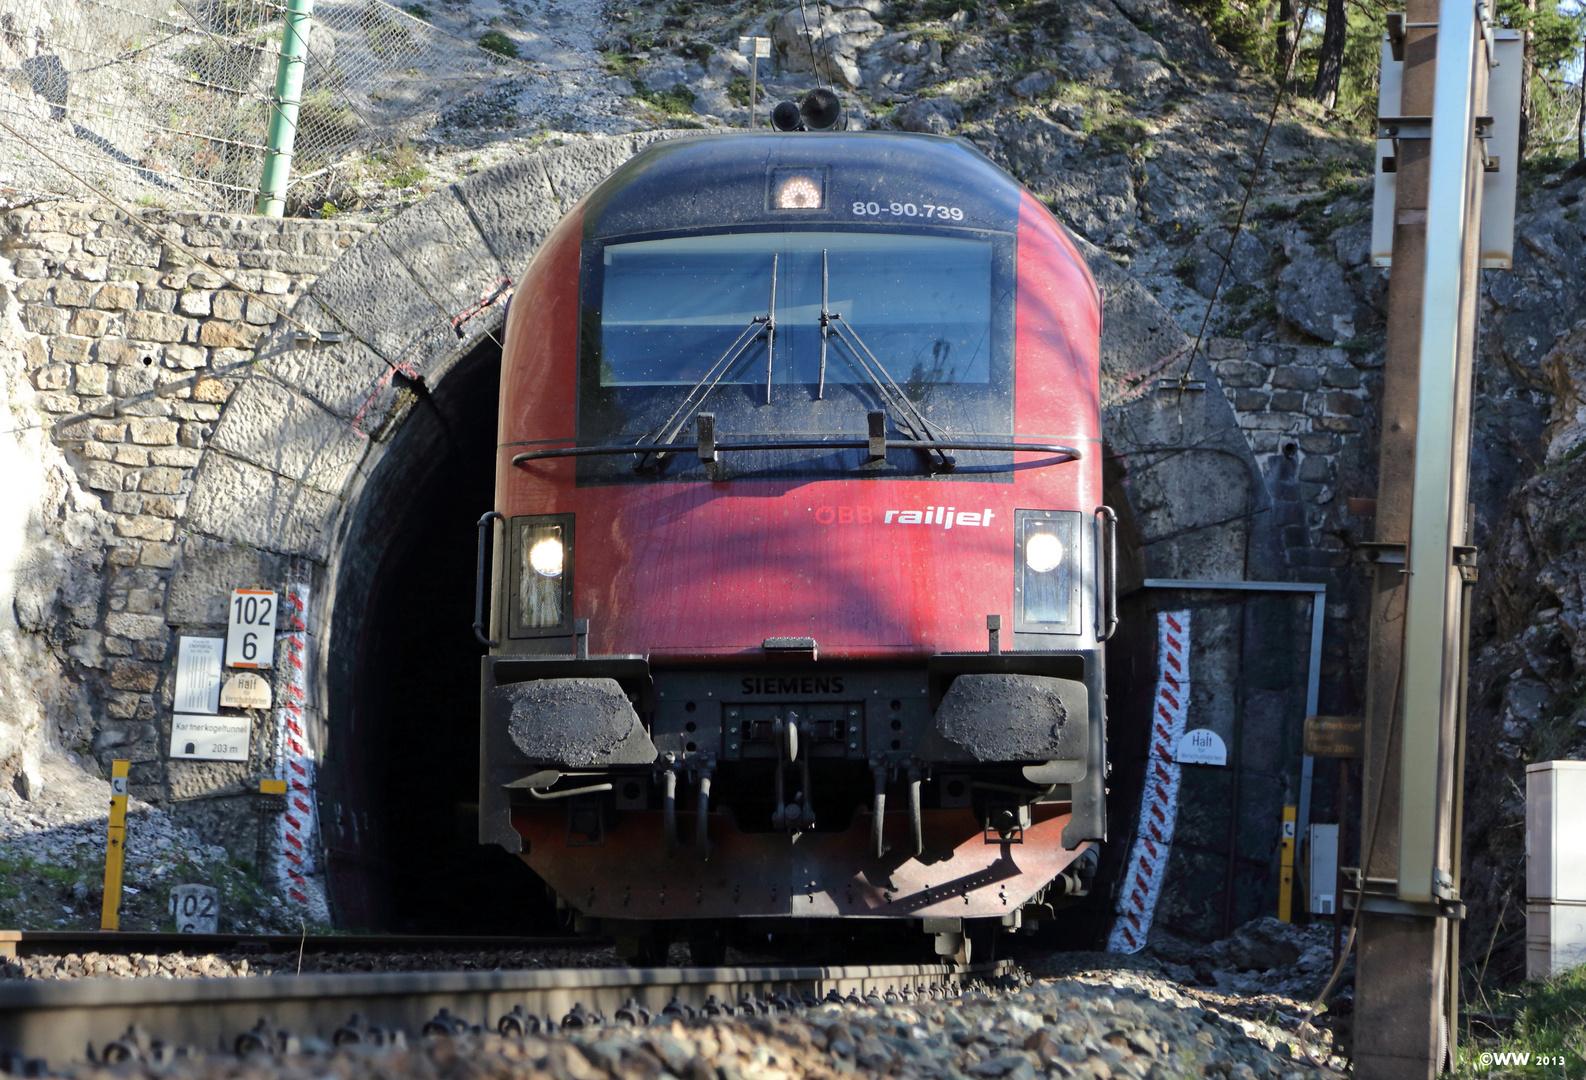 railjet 80-90.739